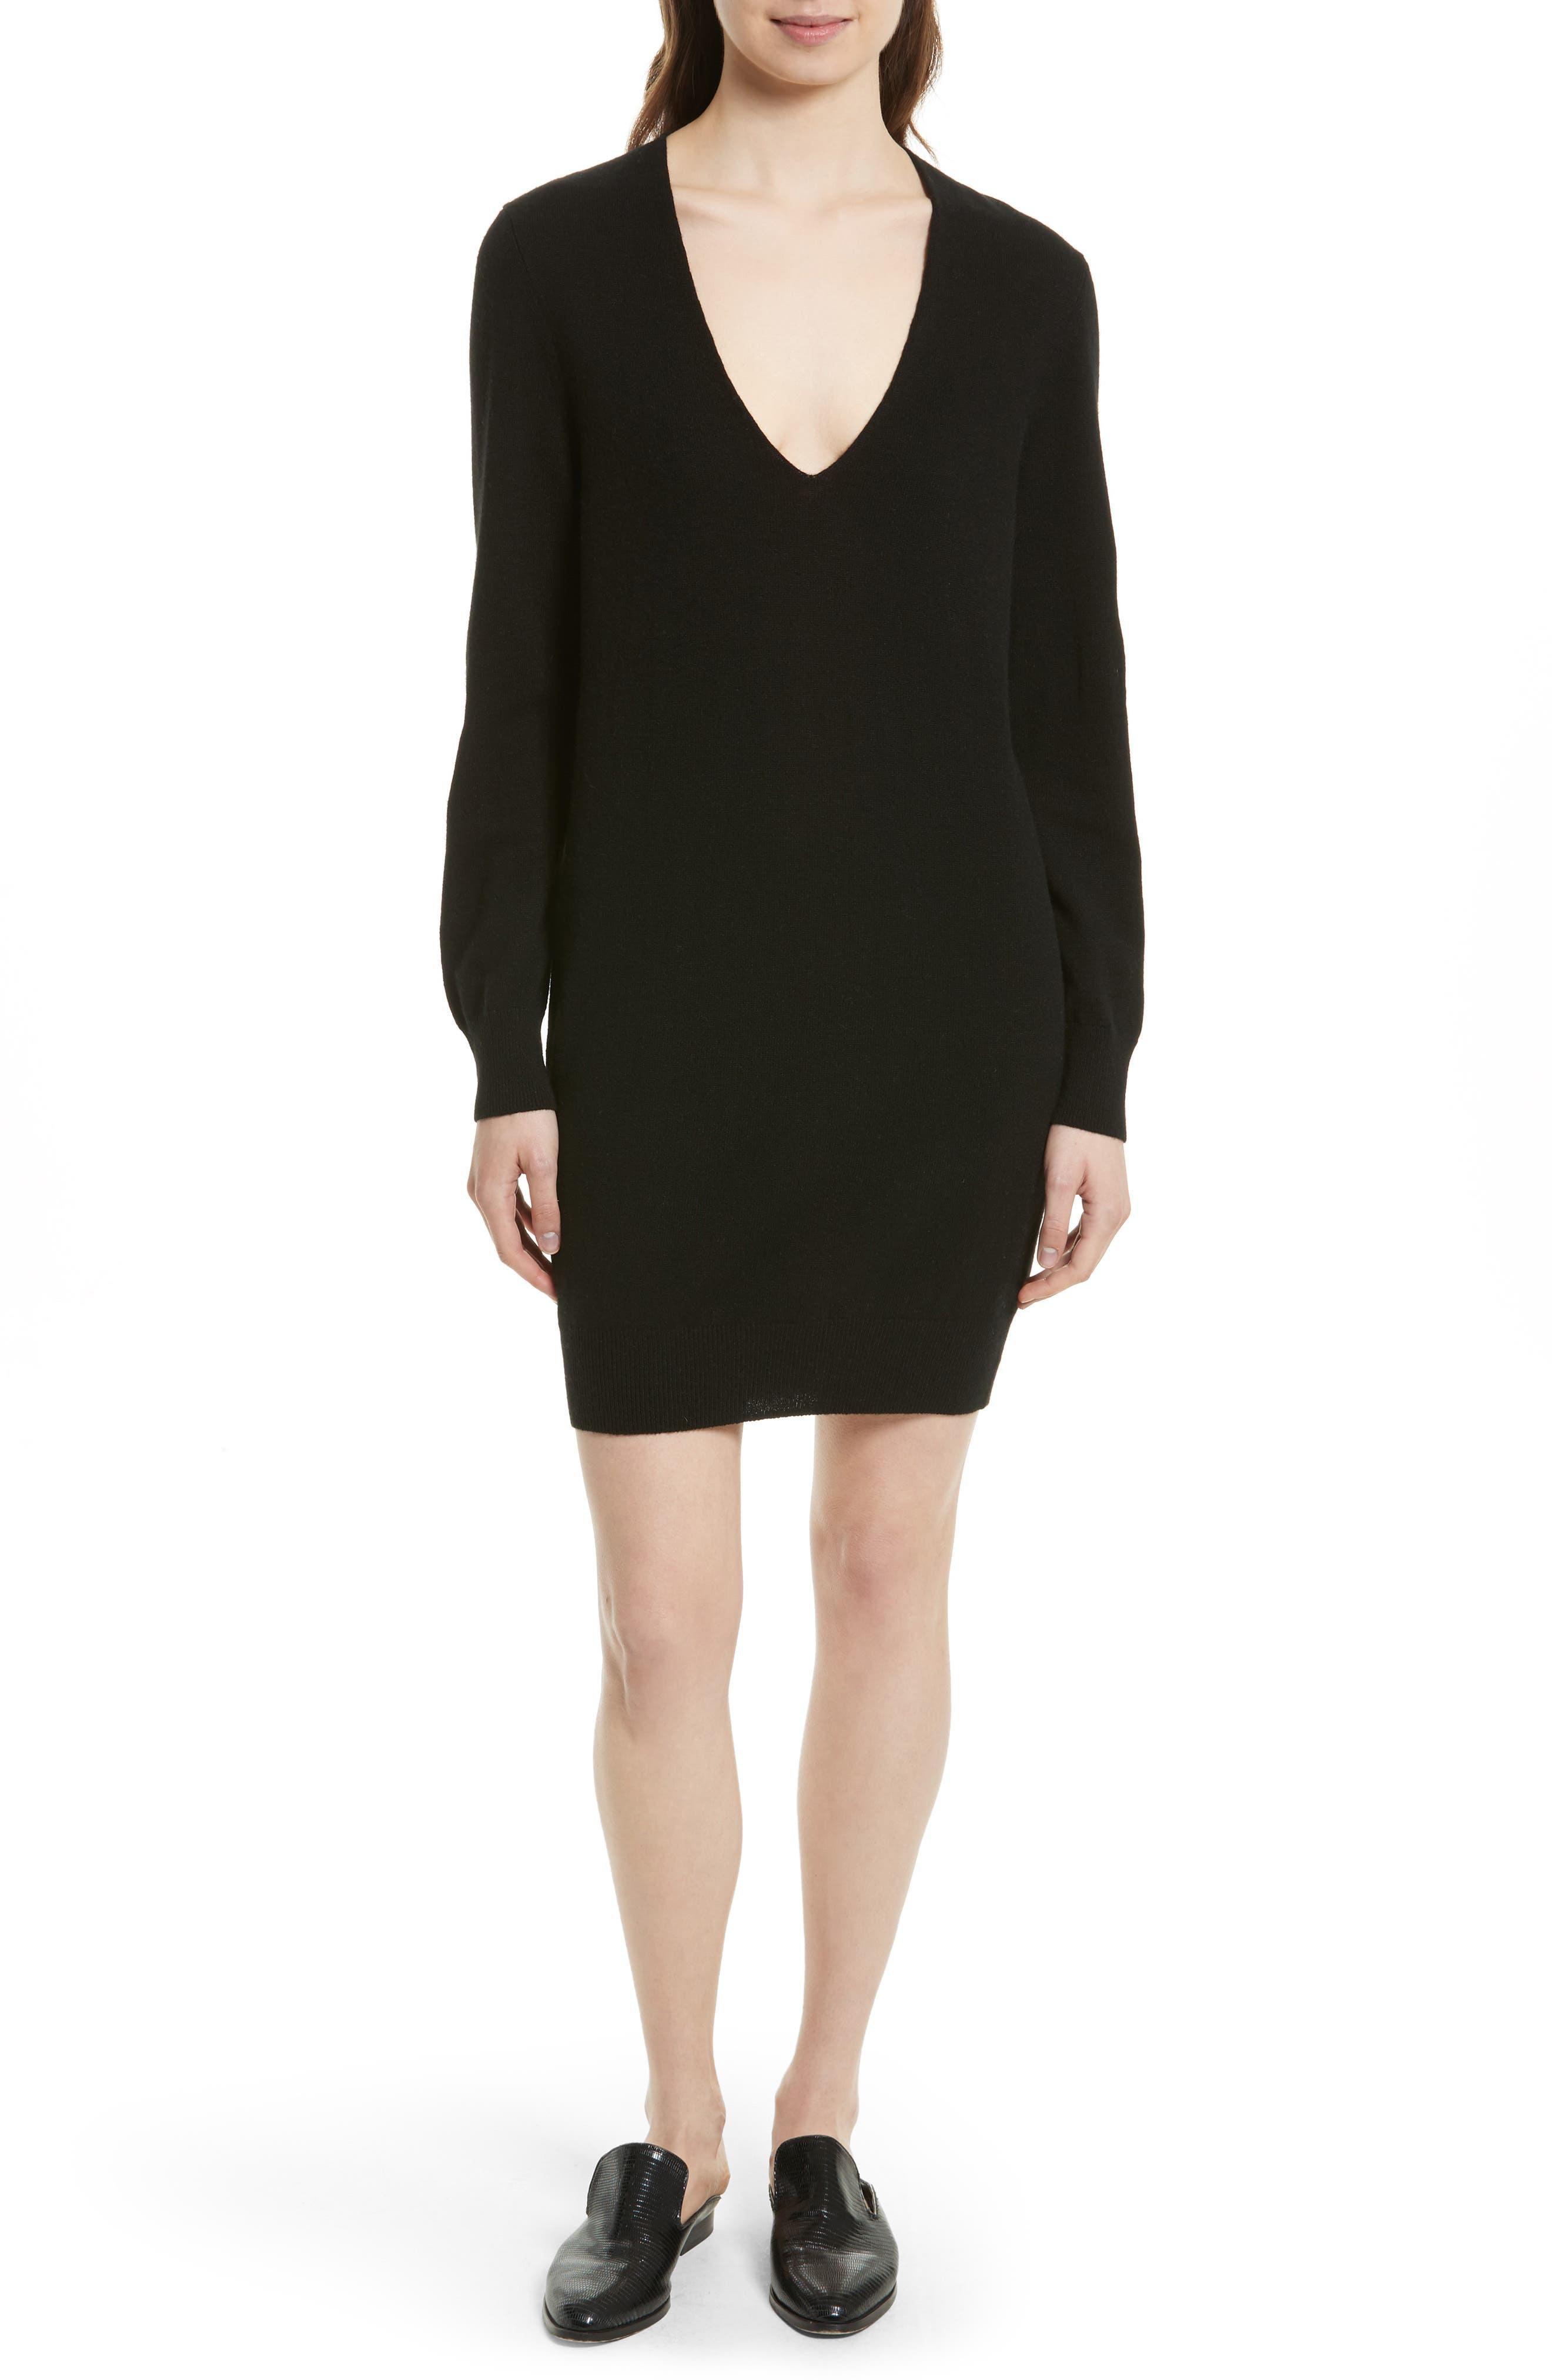 Alternate Image 1 Selected - Equipment Rosemary V-Neck Cashmere Sweater Dress